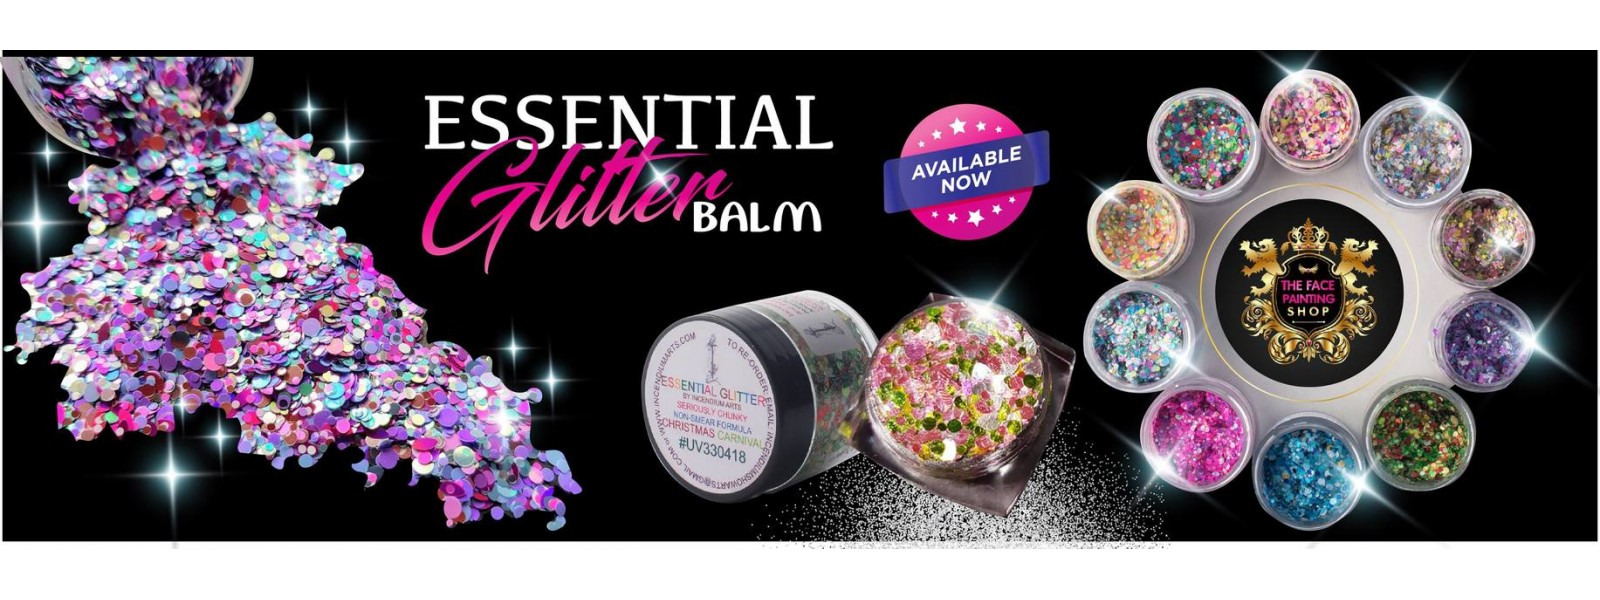 Essential Glitter Balm